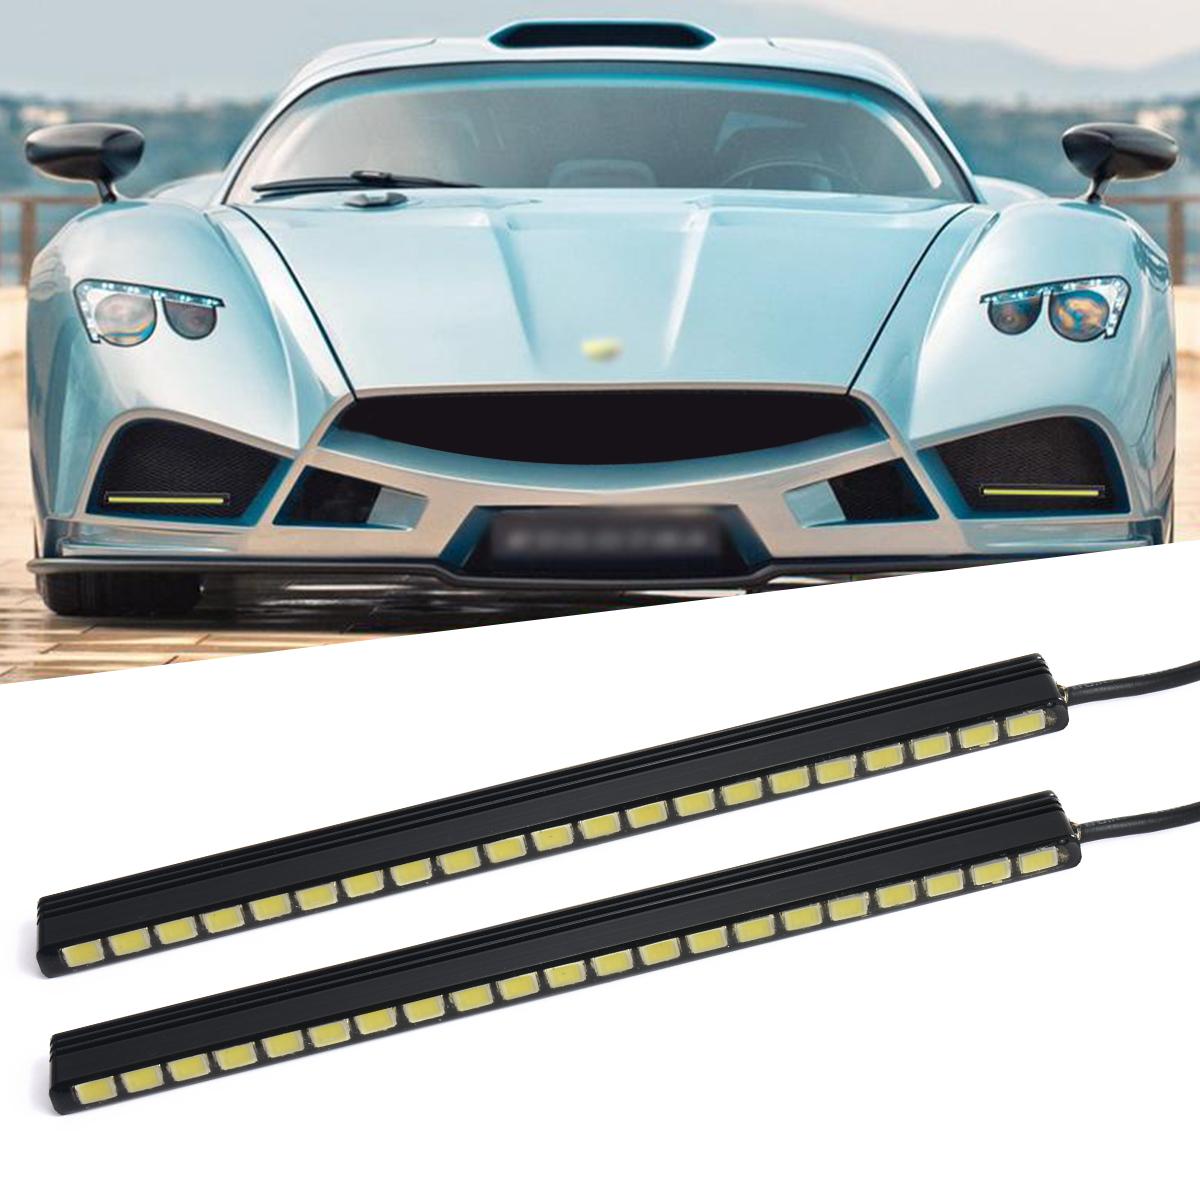 2pcs Daytime Running Light 5630 SMD 21LED Car DRL Bright Driving Fog Day Head Lamp Waterproof